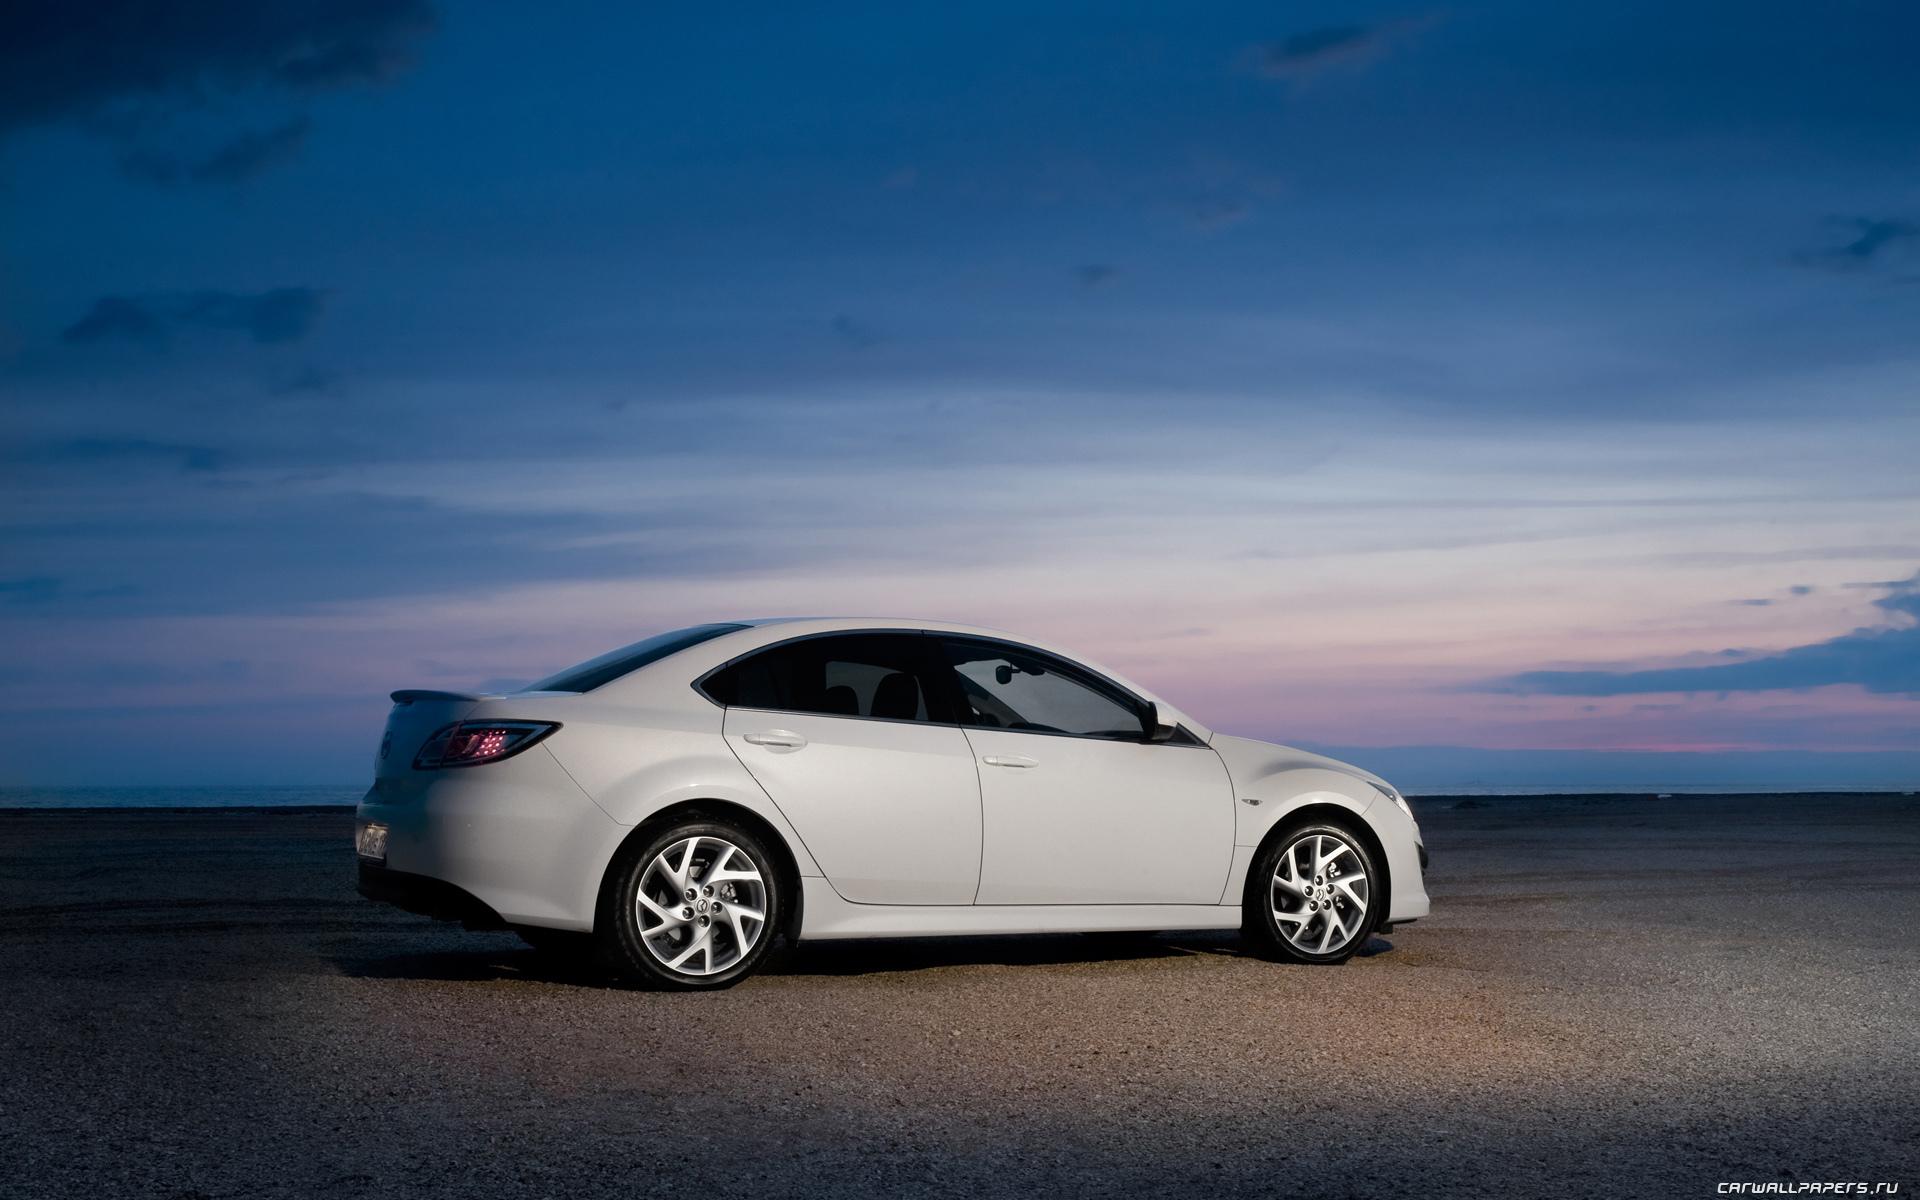 Mazda 6 Wallpapers